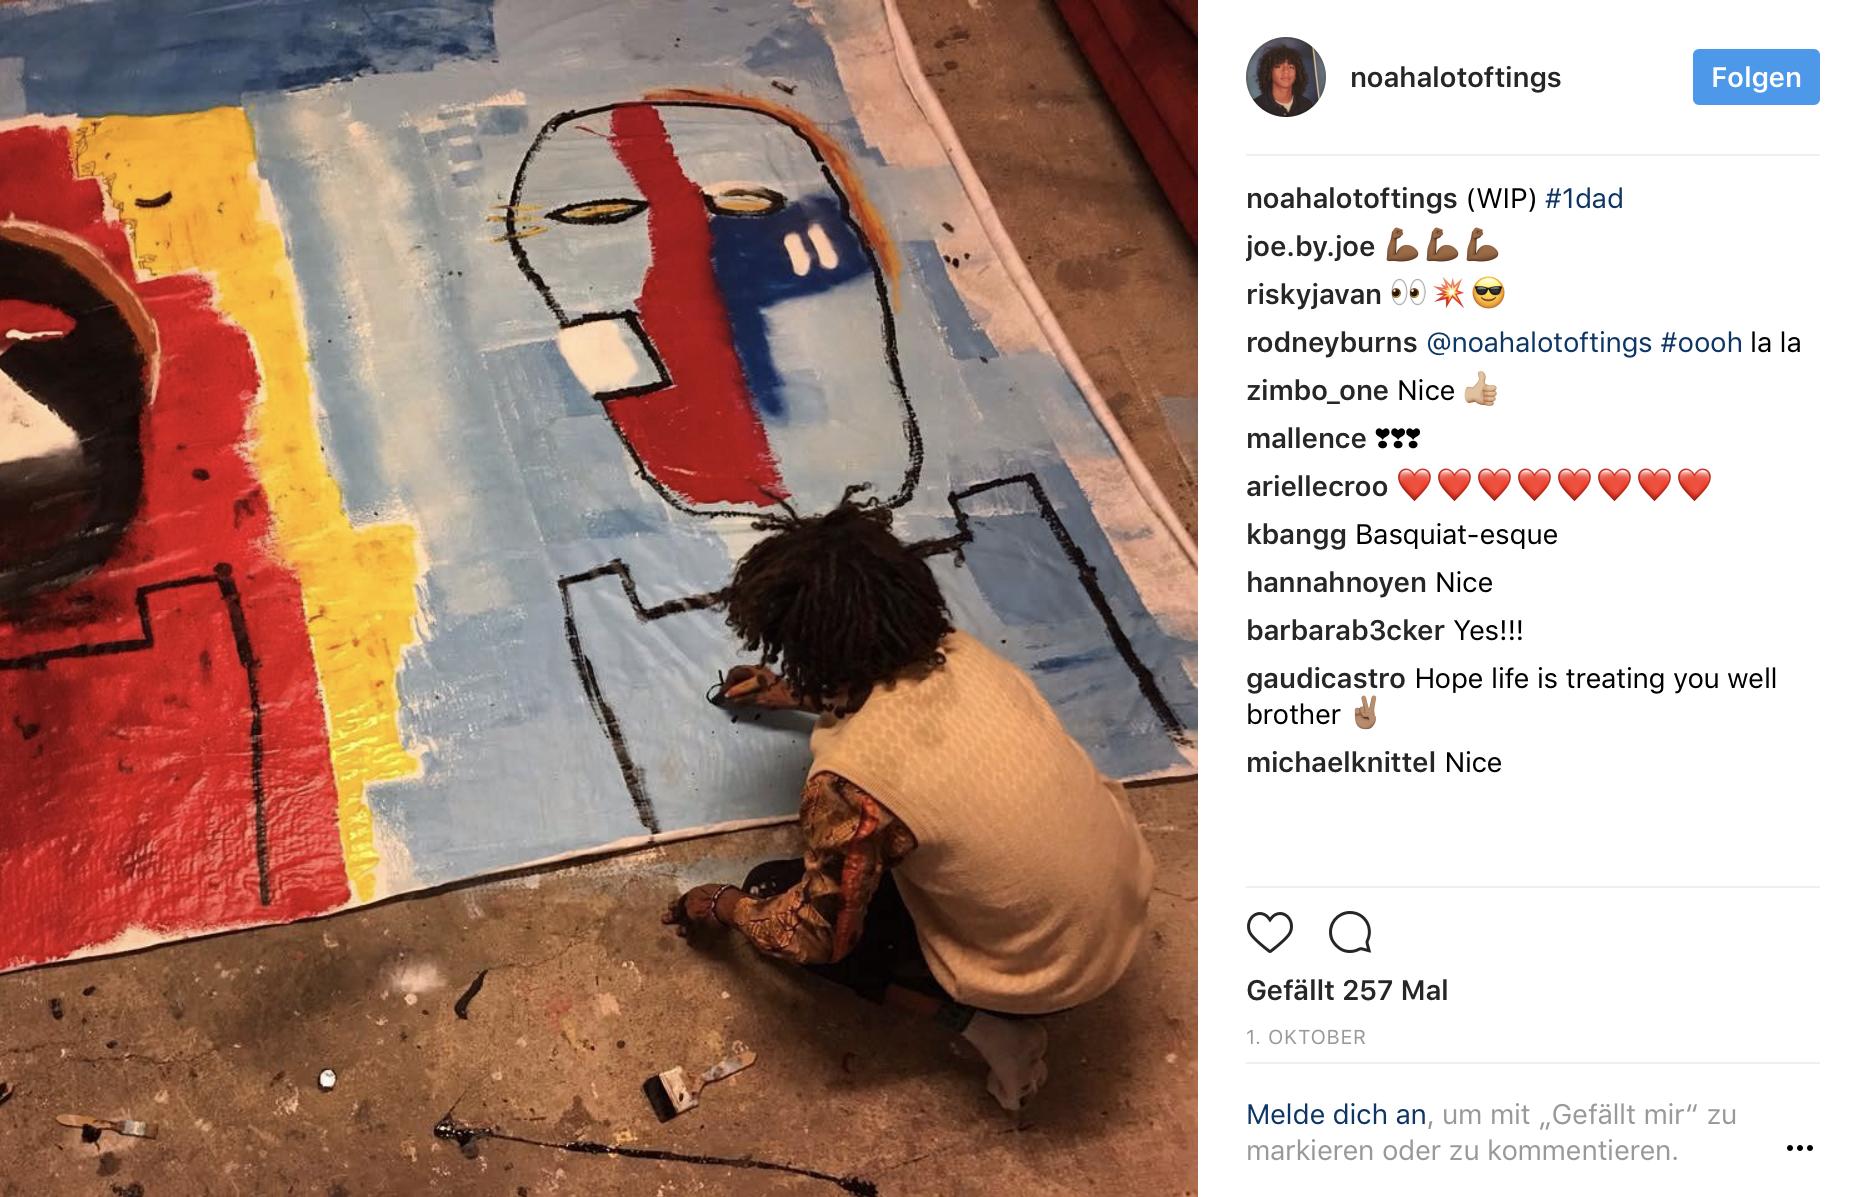 Noah Becker Instagram